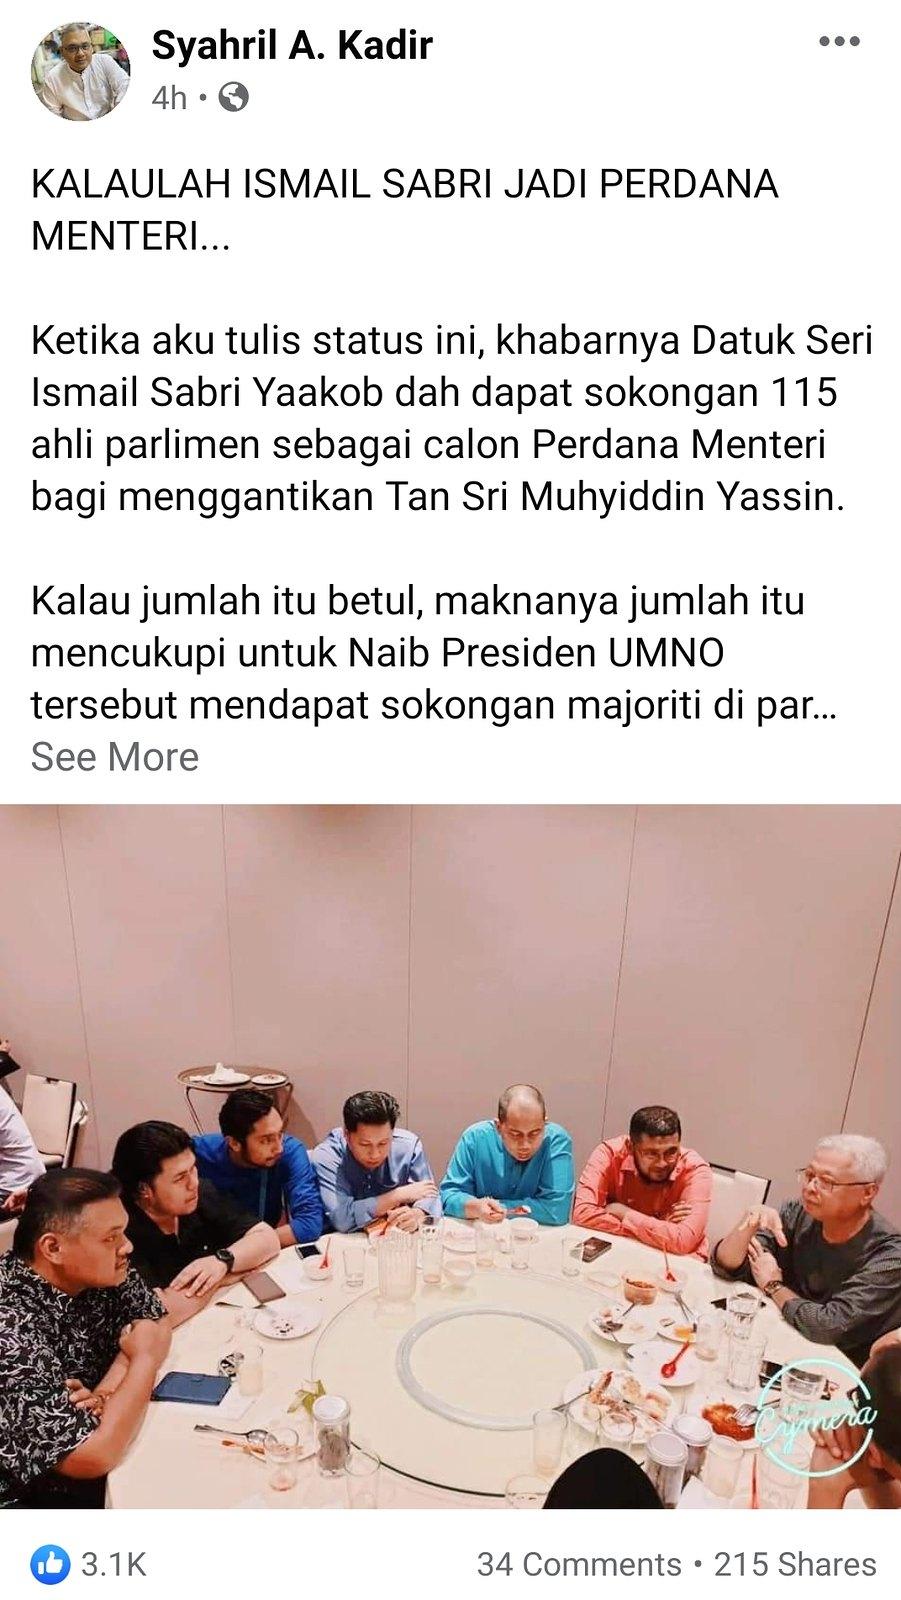 Wartawan Ini Dedah Apa Akan Jadi Jika Ismail Sabri Menjadi Perdana Menteri